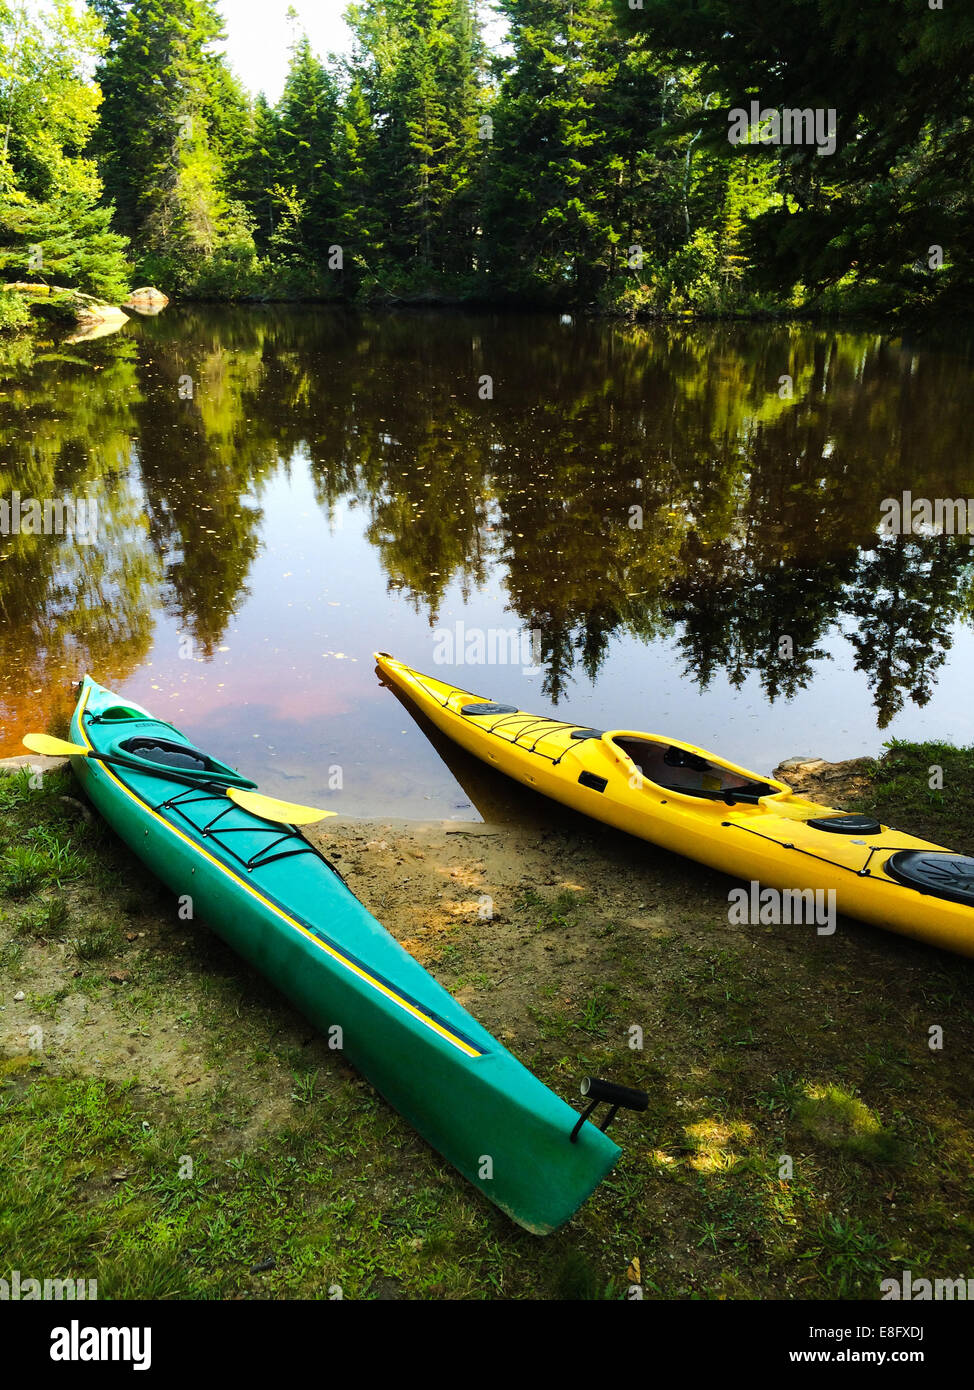 USA, Maine, Kayaks - Stock Image